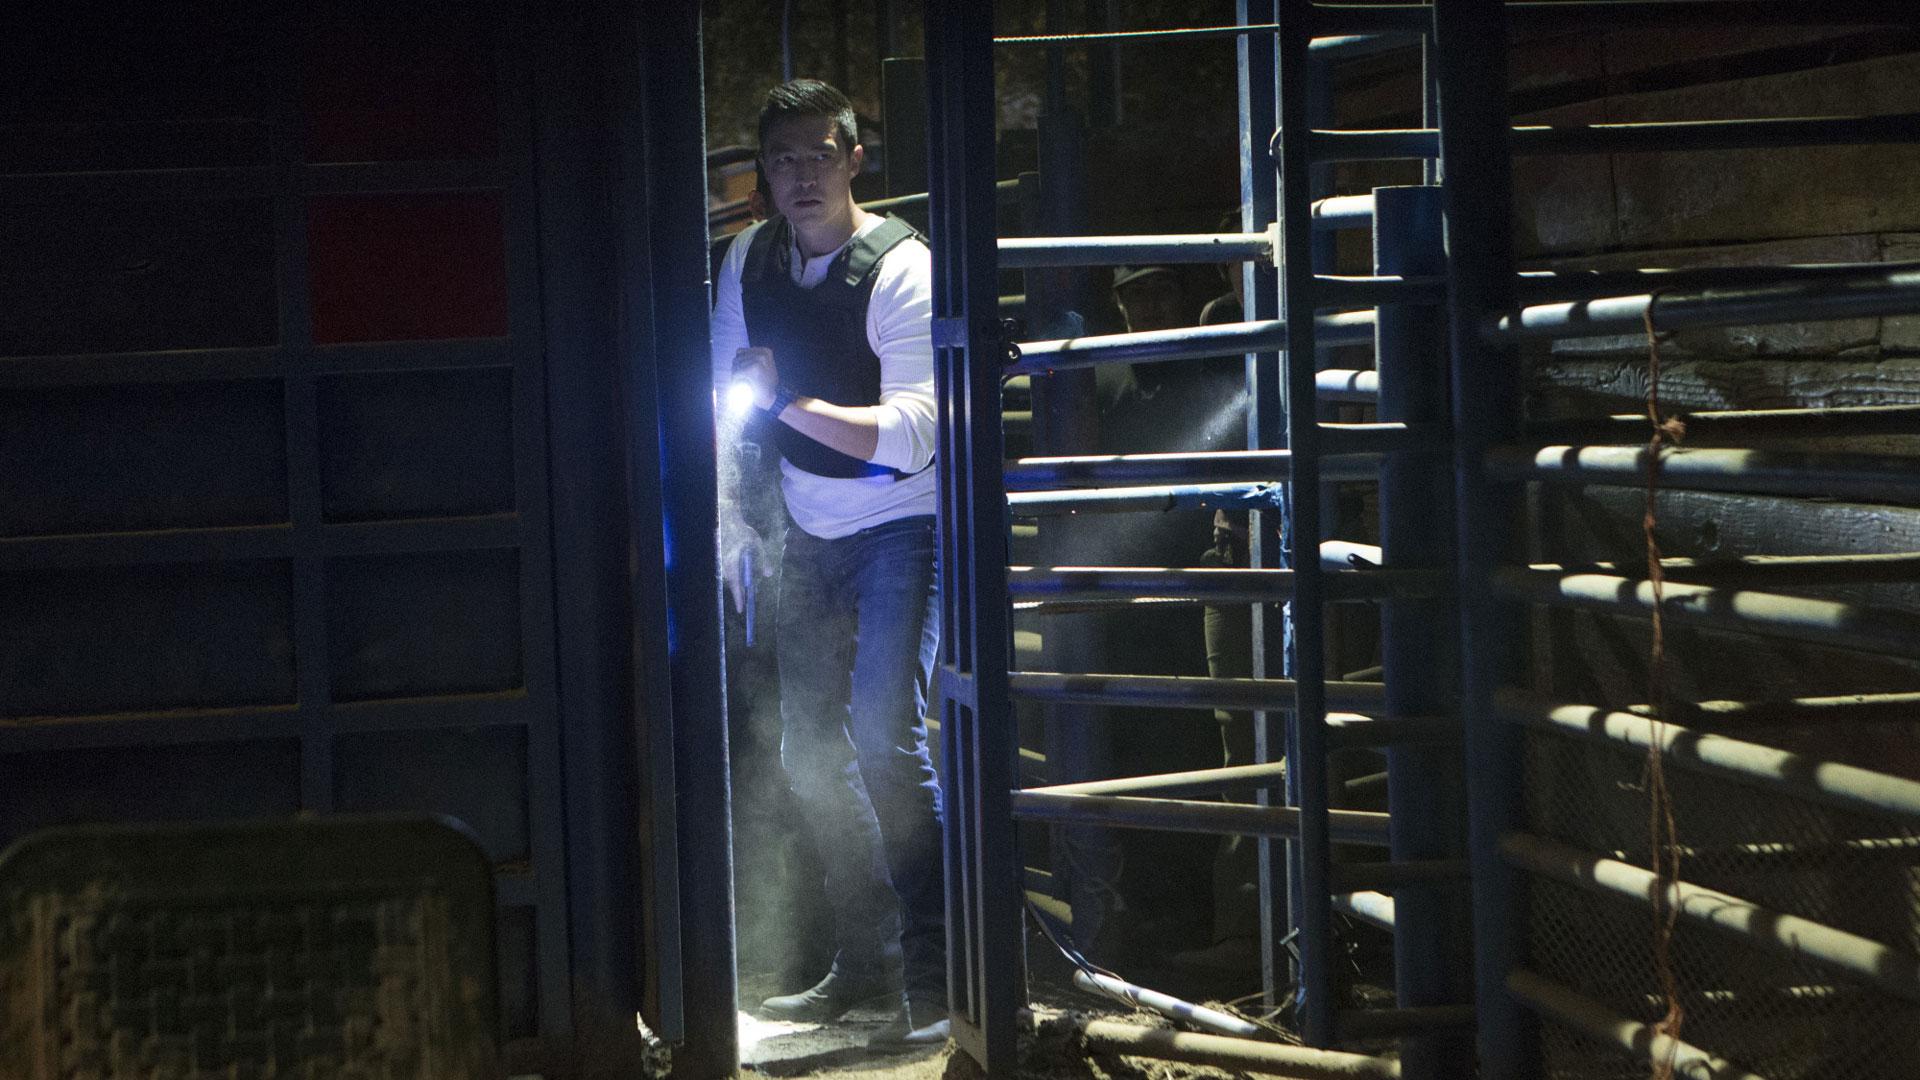 Agent Matthew Simmons enters the scene.